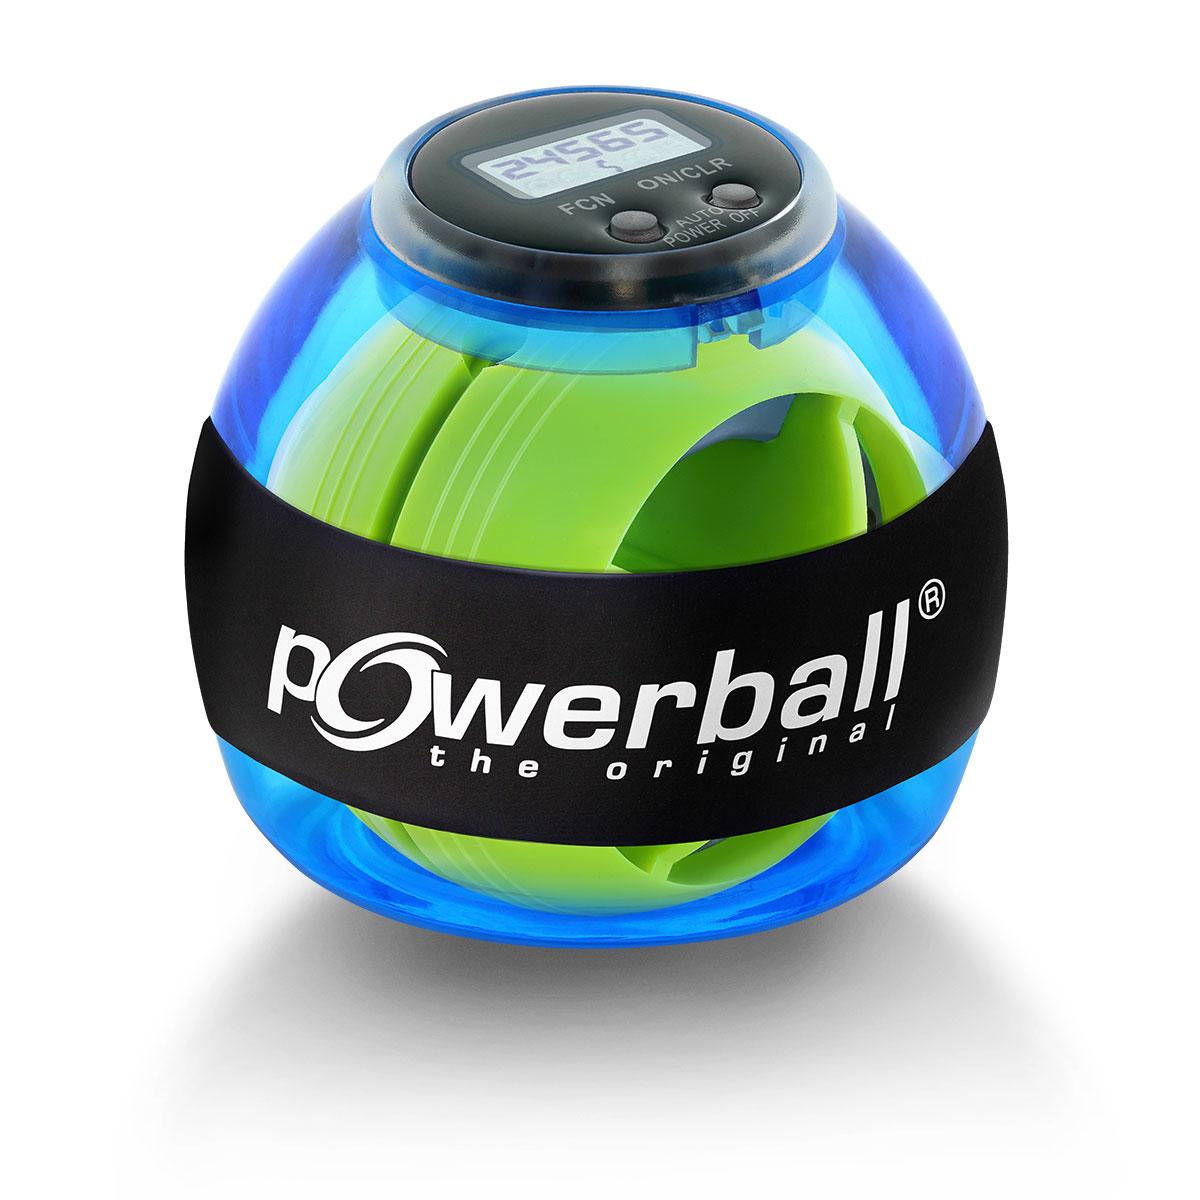 Original Powerball Counter